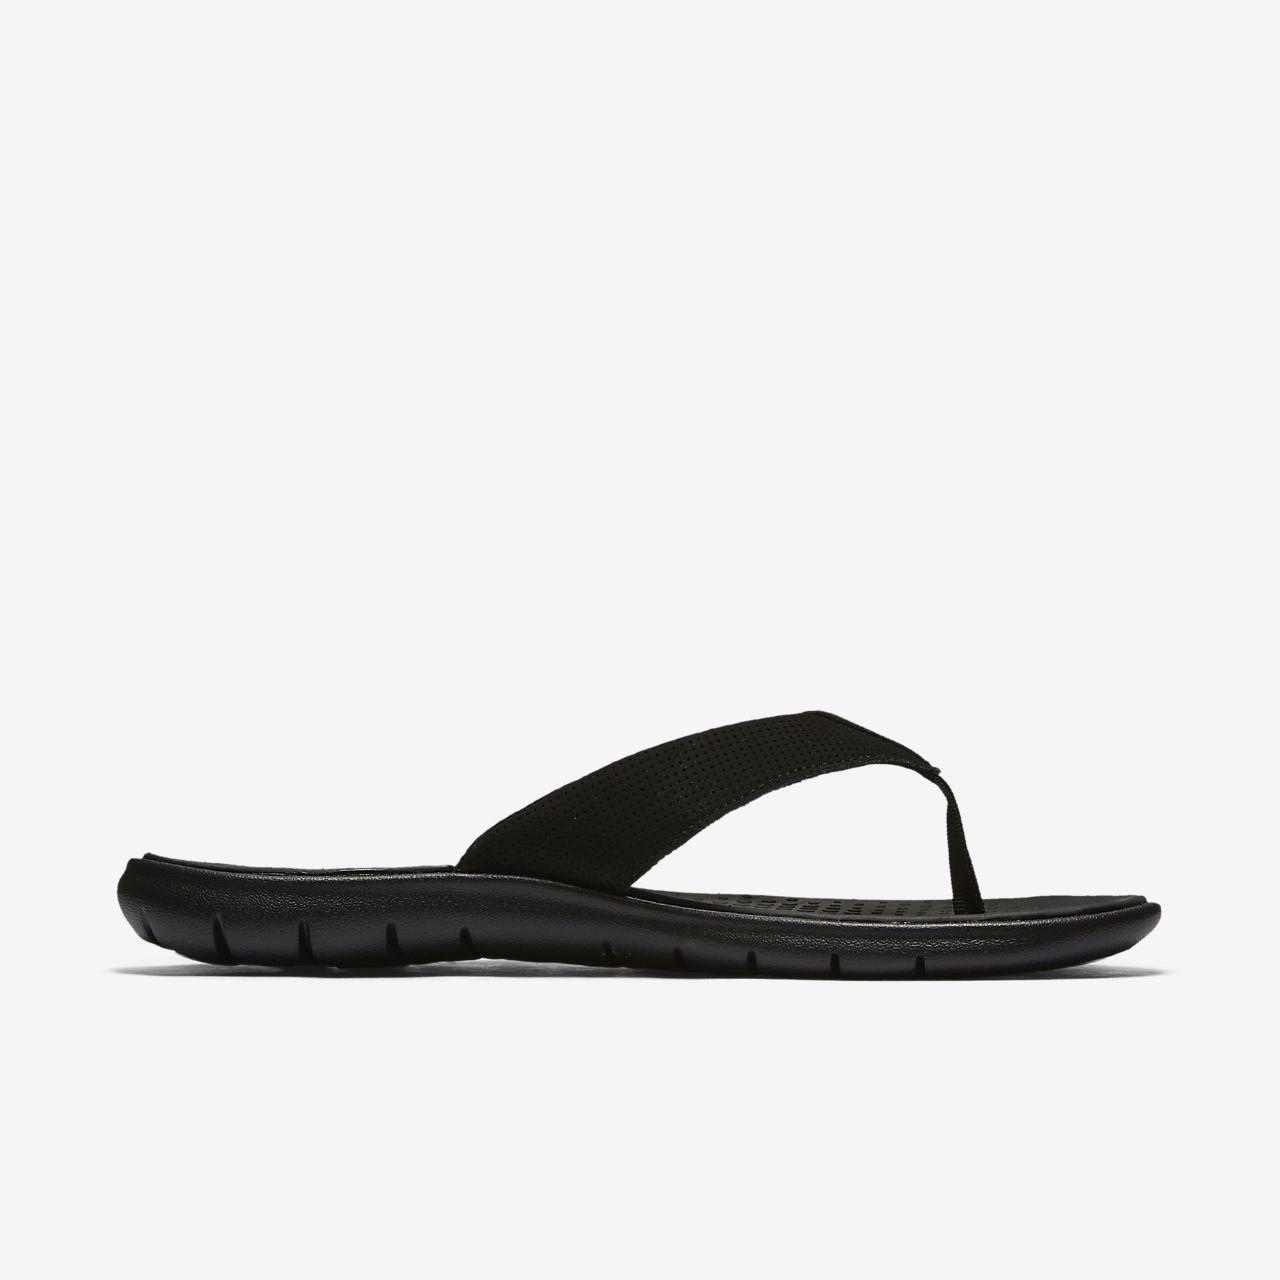 Nike Hurley Fusion Girls Sandal Shoes Black